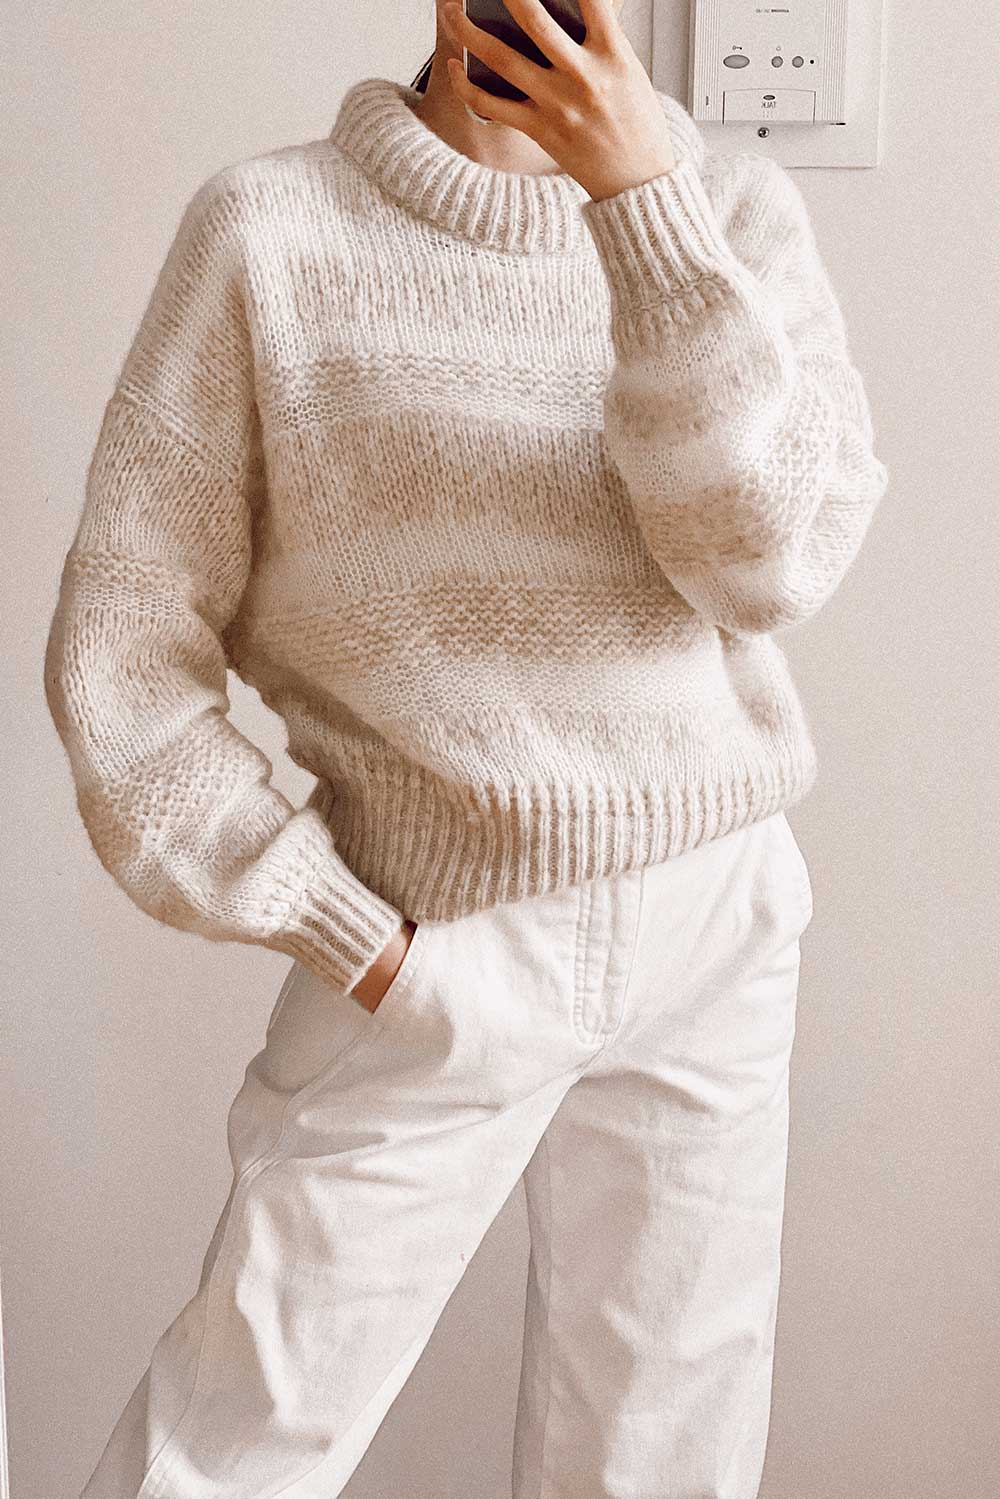 everlane-puff-sweater